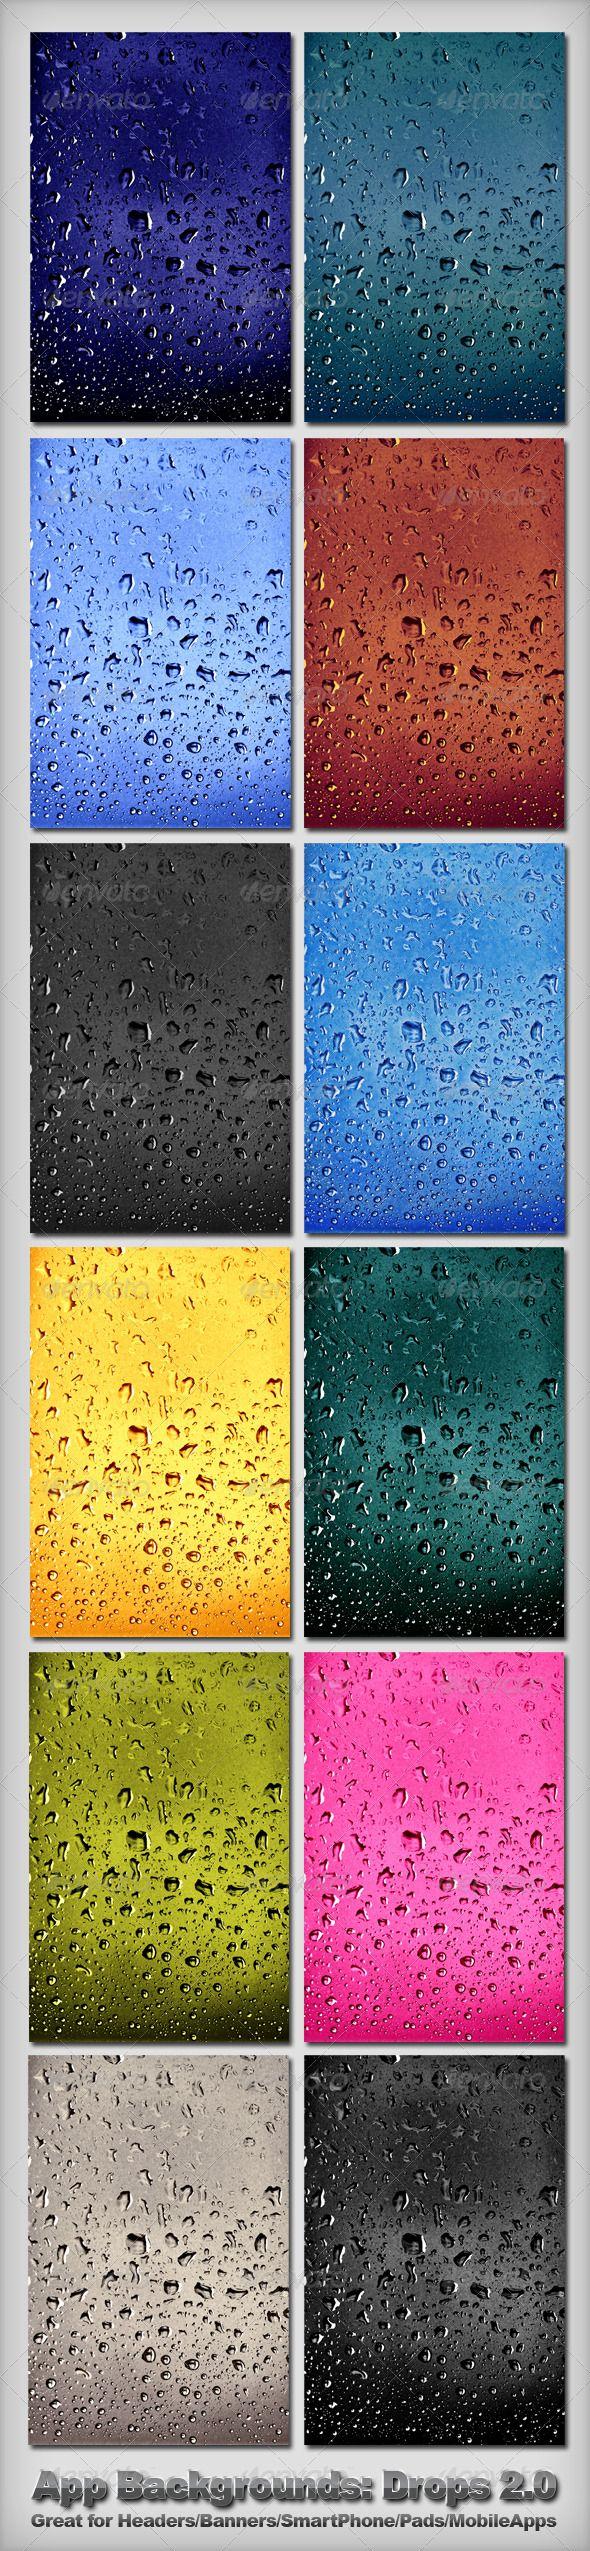 App Backgrounds - Drops 2.0